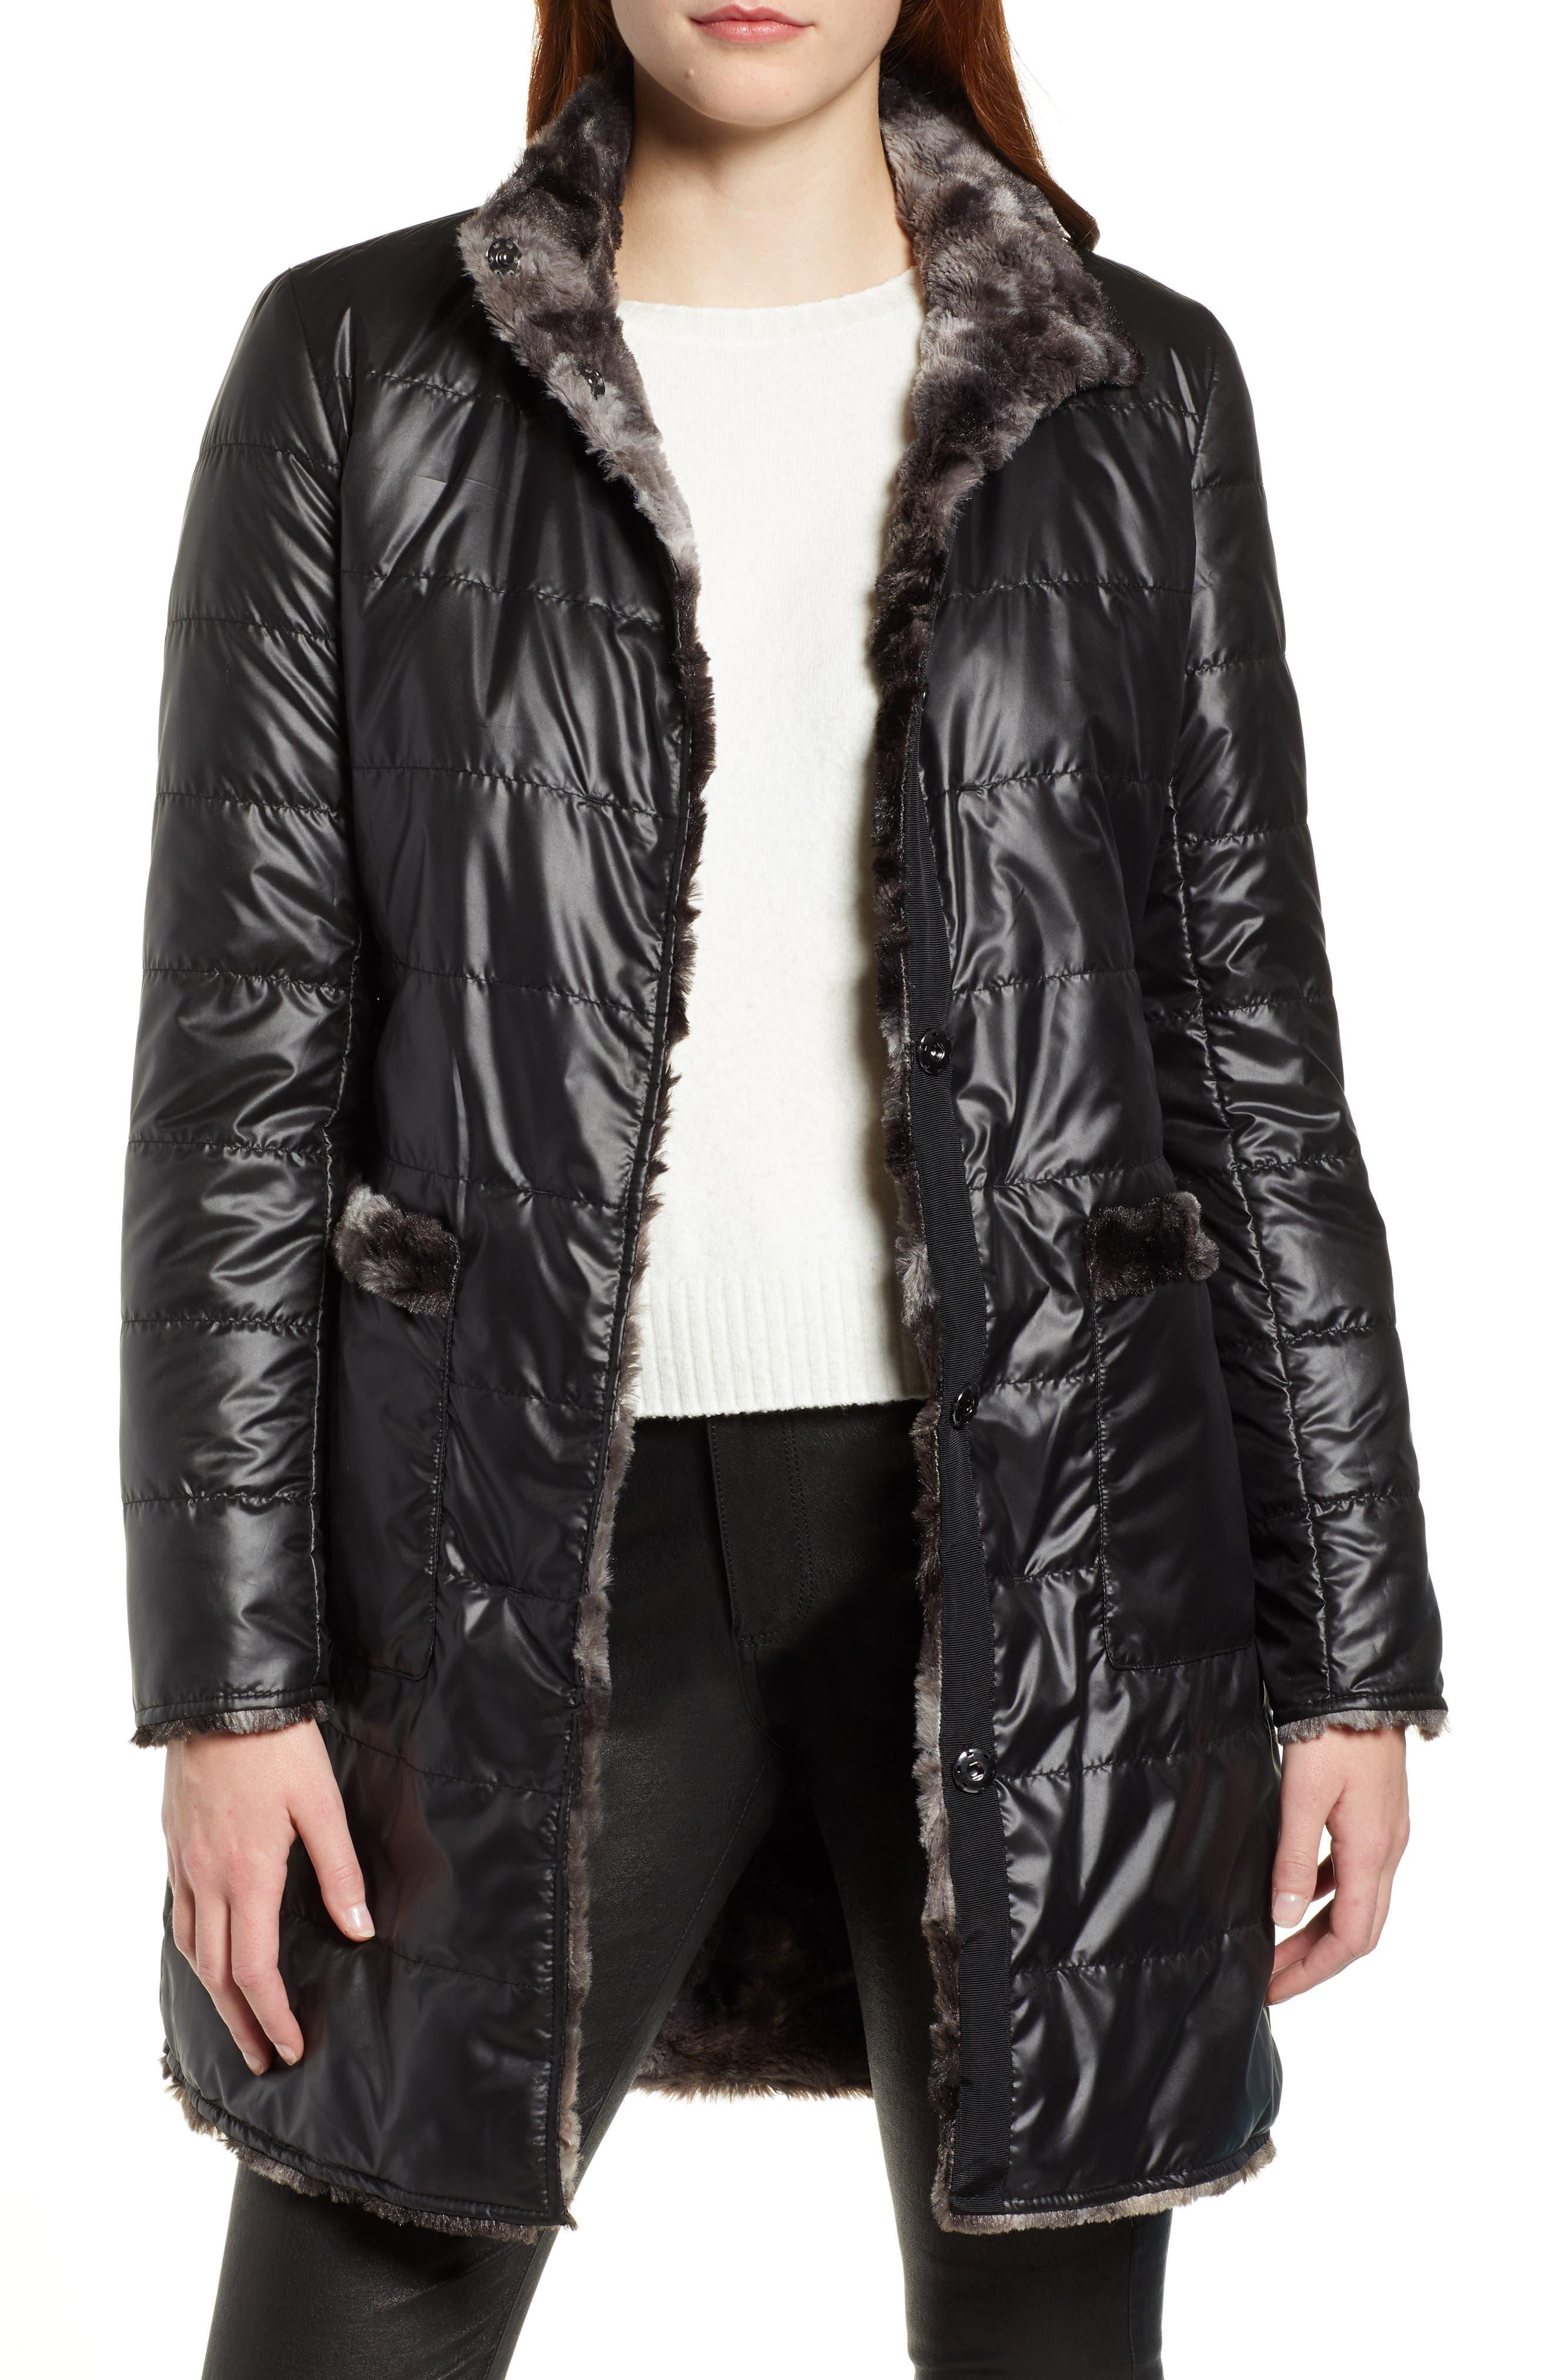 VIA SPIGA, Reversible Faux Marled Fur Coat, Alternate thumbnail 2, color, MARLED